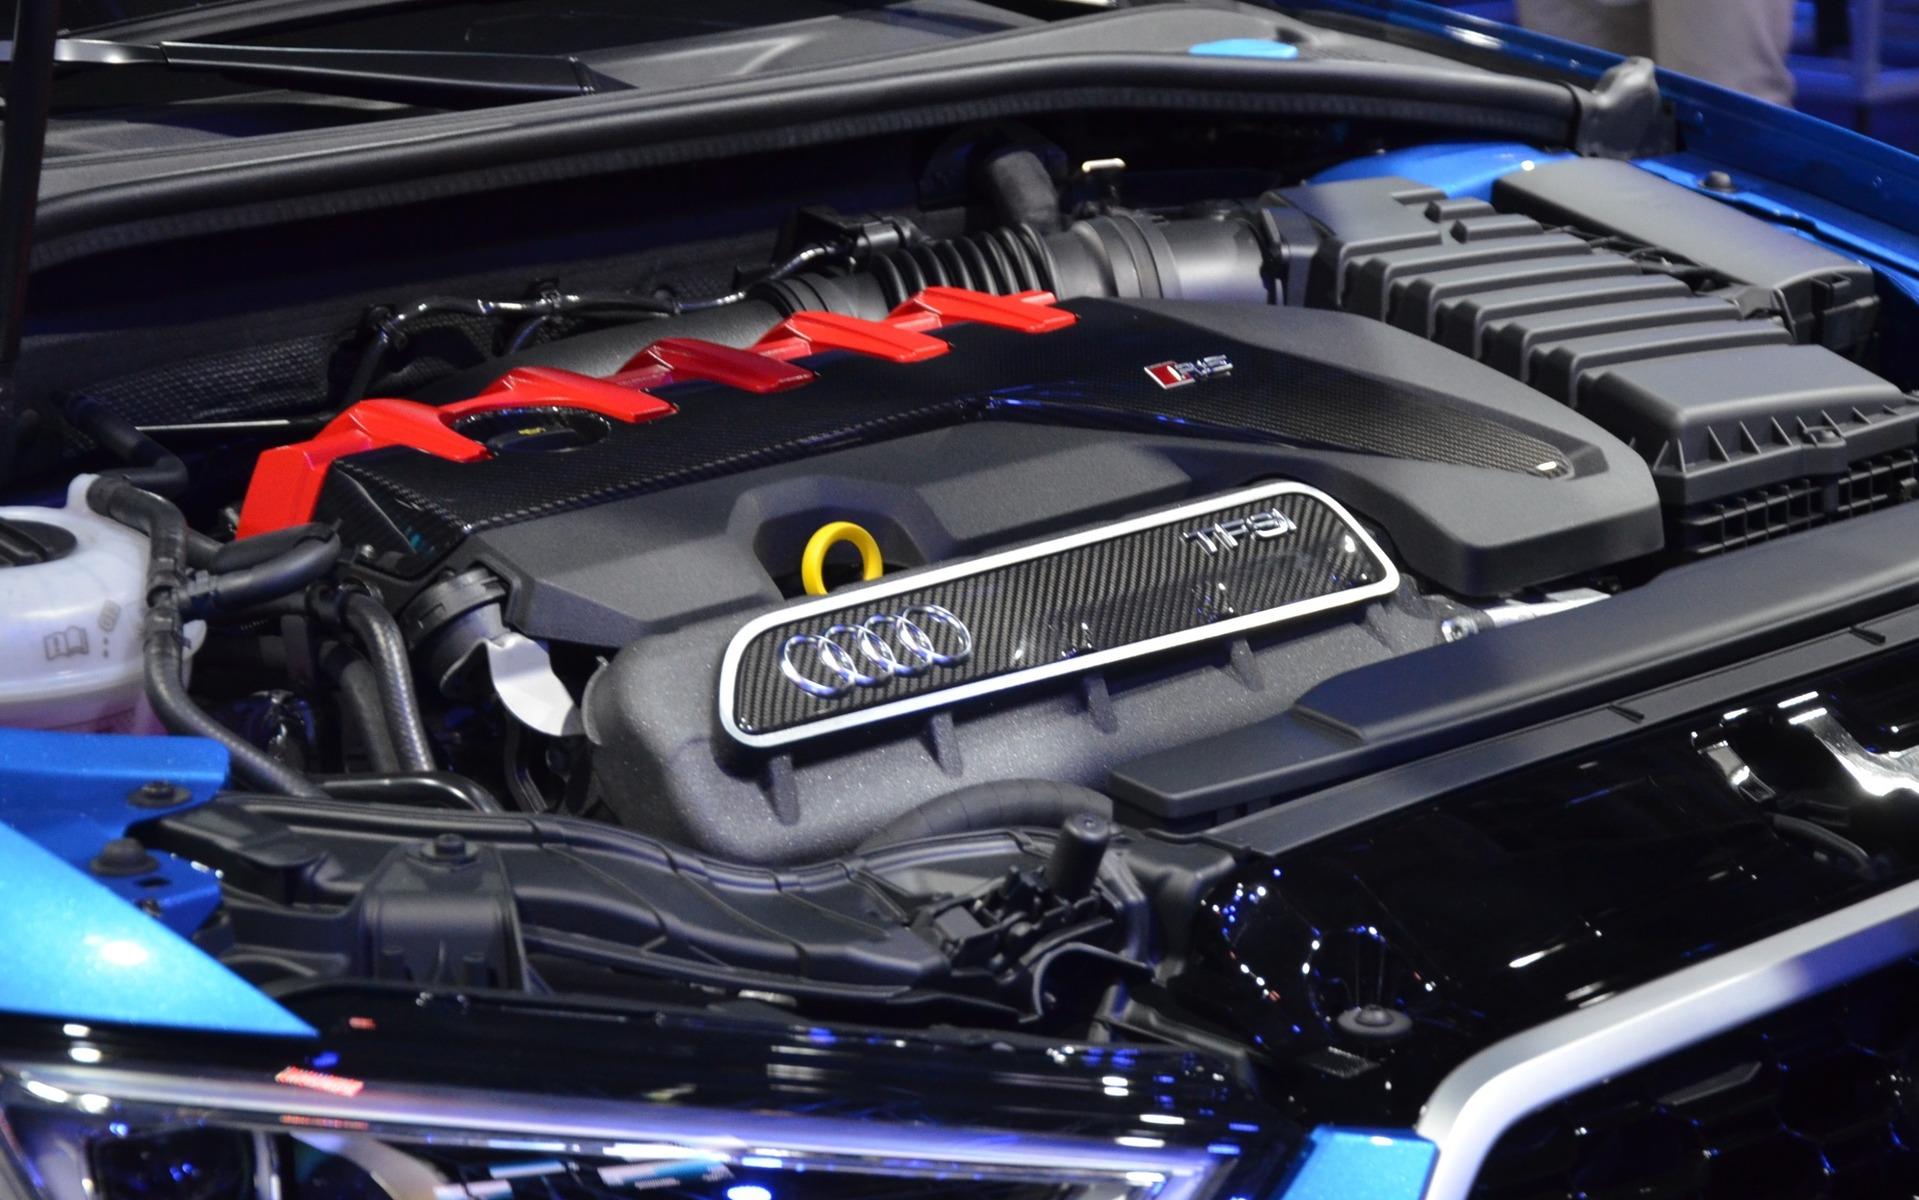 Audi Rs 3 Arriv 233 E Programm 233 E Au Canada 224 L 233 T 233 2017 4 9